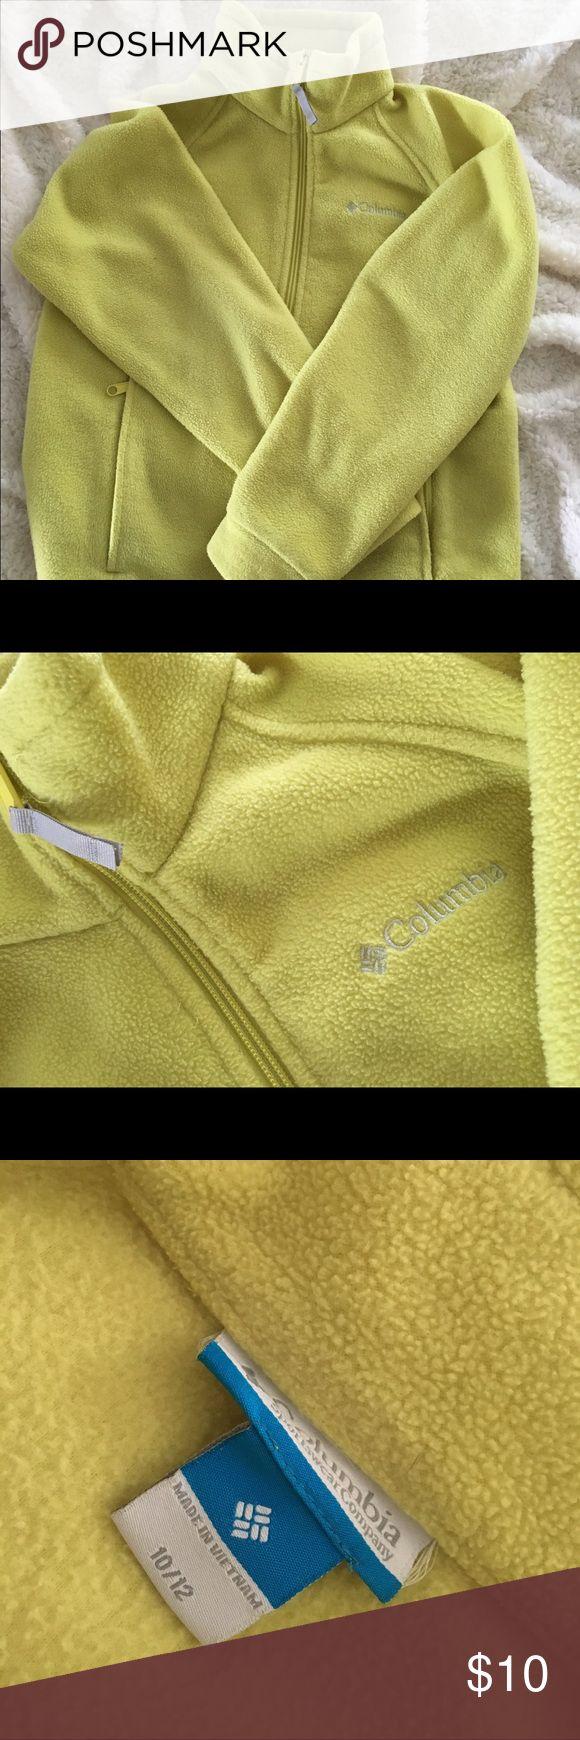 Columbia Kids Fleece Jacket Great color - 10/12 warm fleece Columbia Kids Jacket! Columbia Jackets & Coats